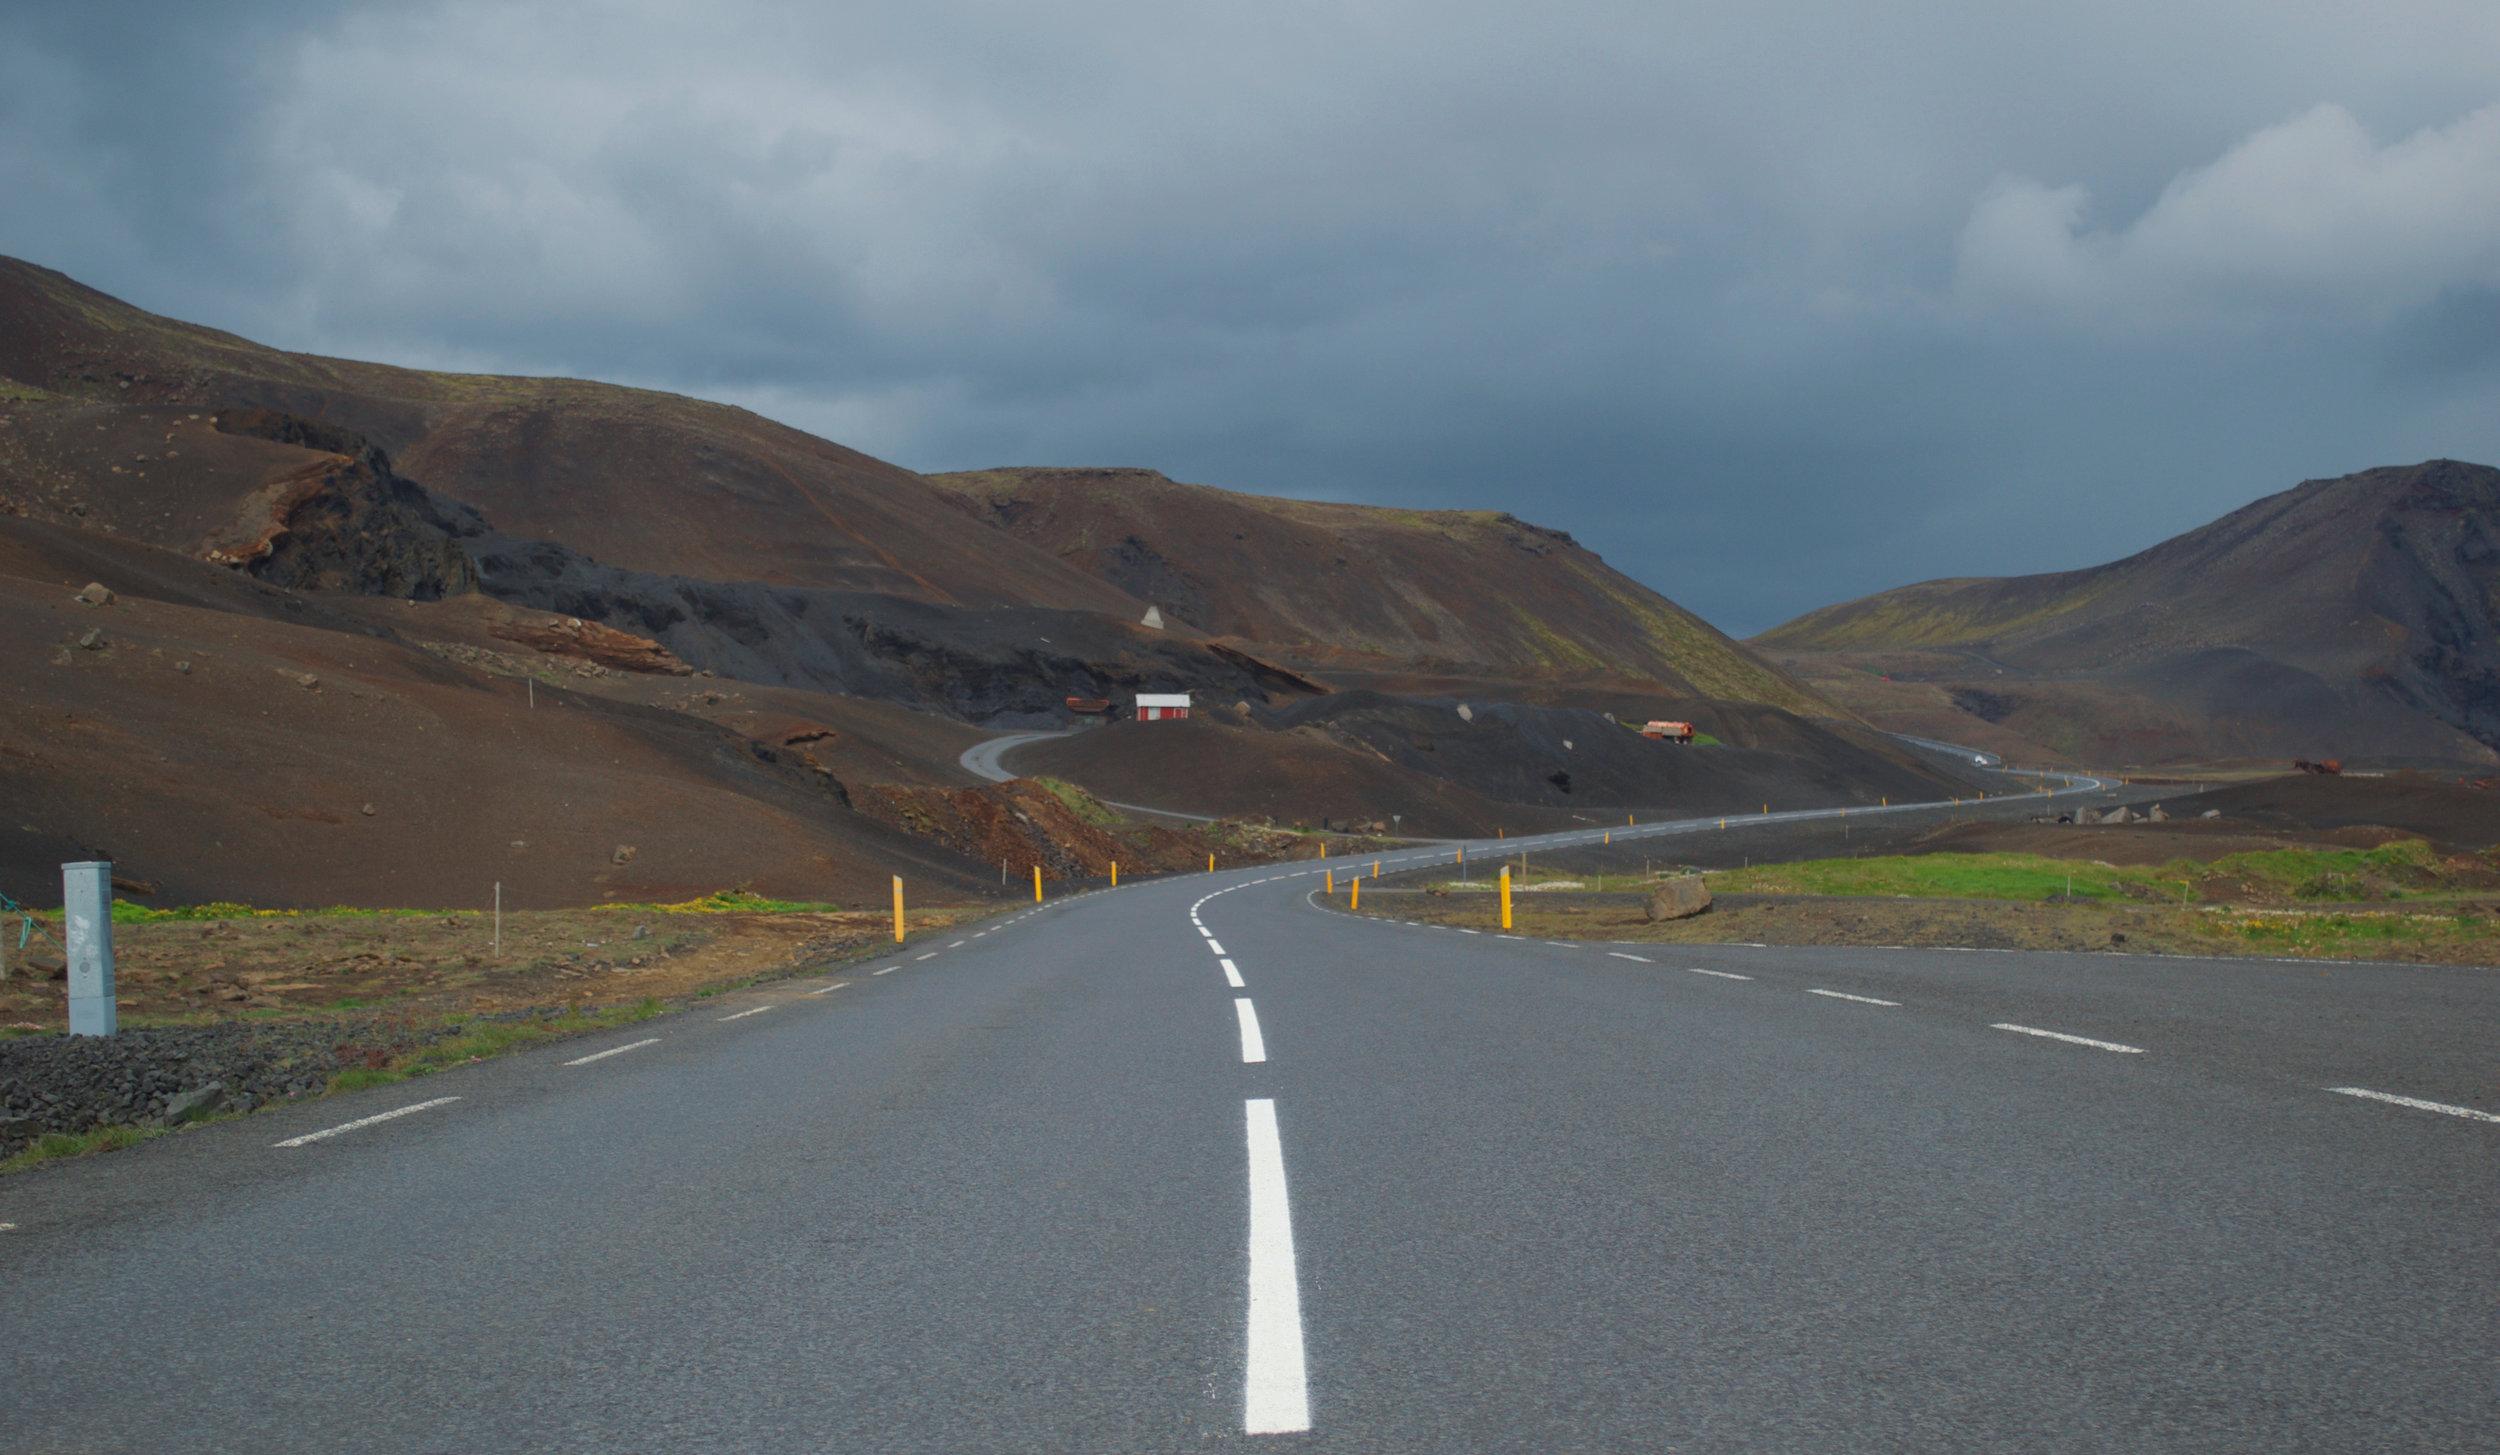 Somewhere in Iceland. Nikon D3100.